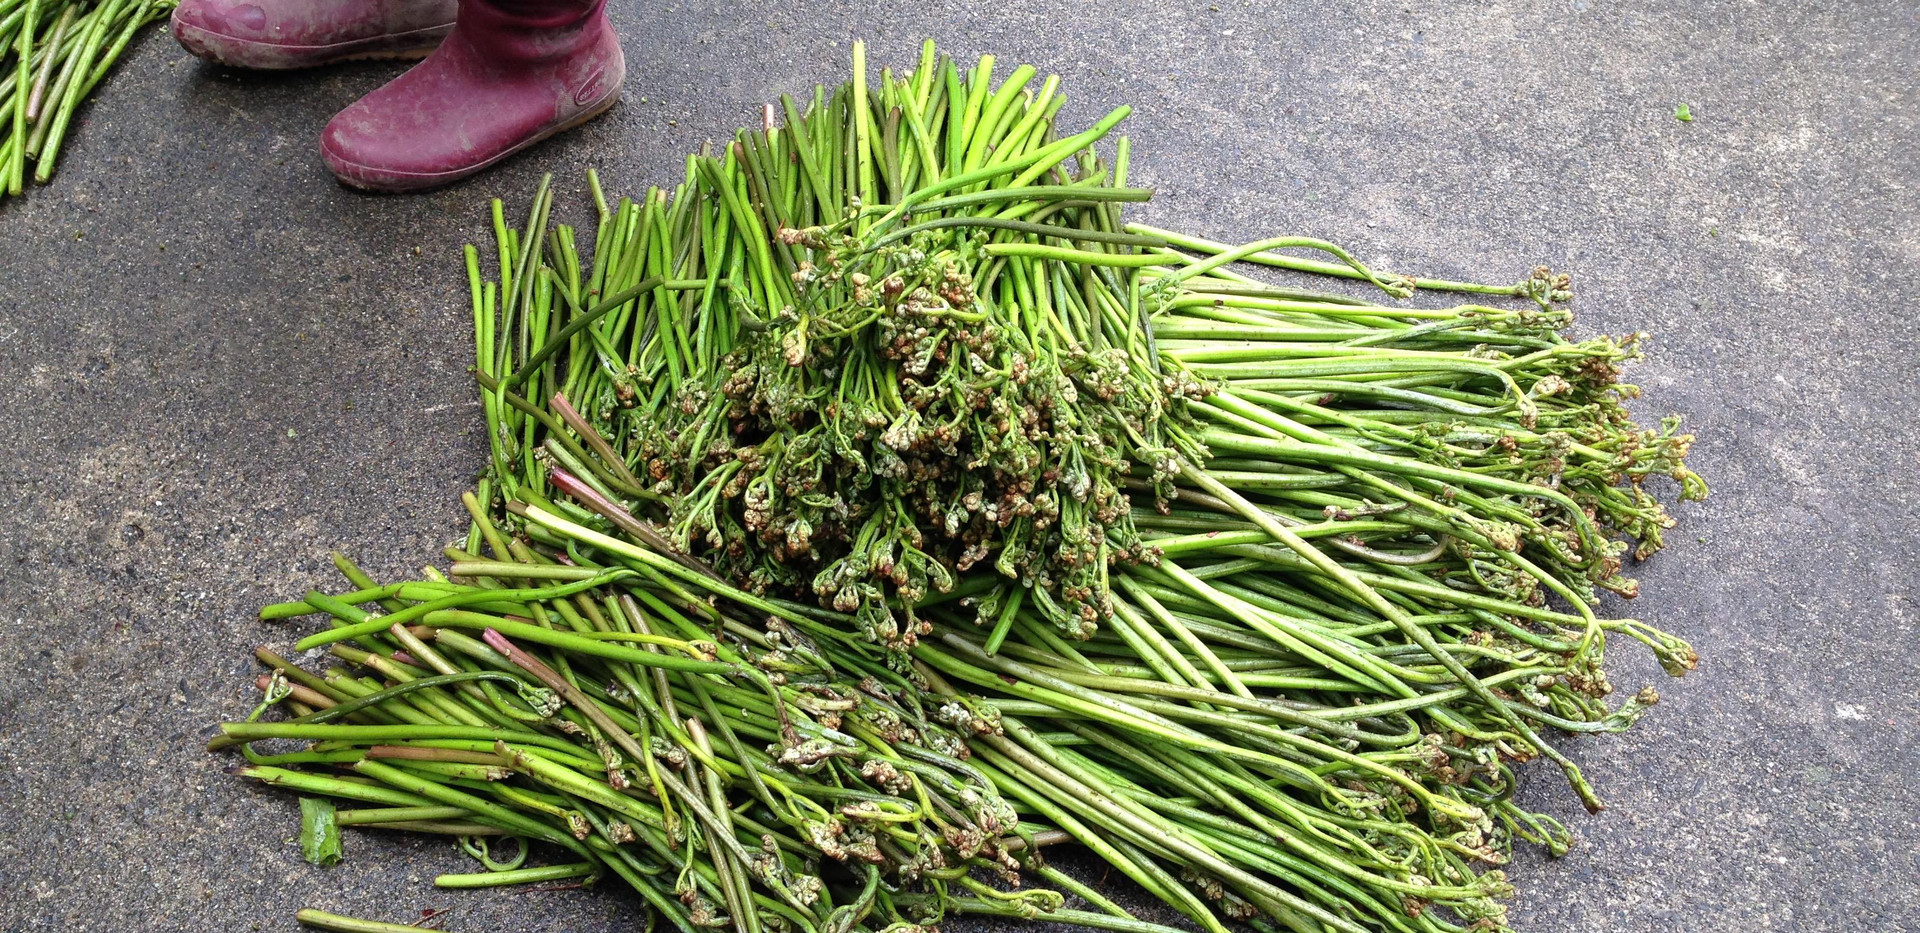 新潟 山北 山菜採り